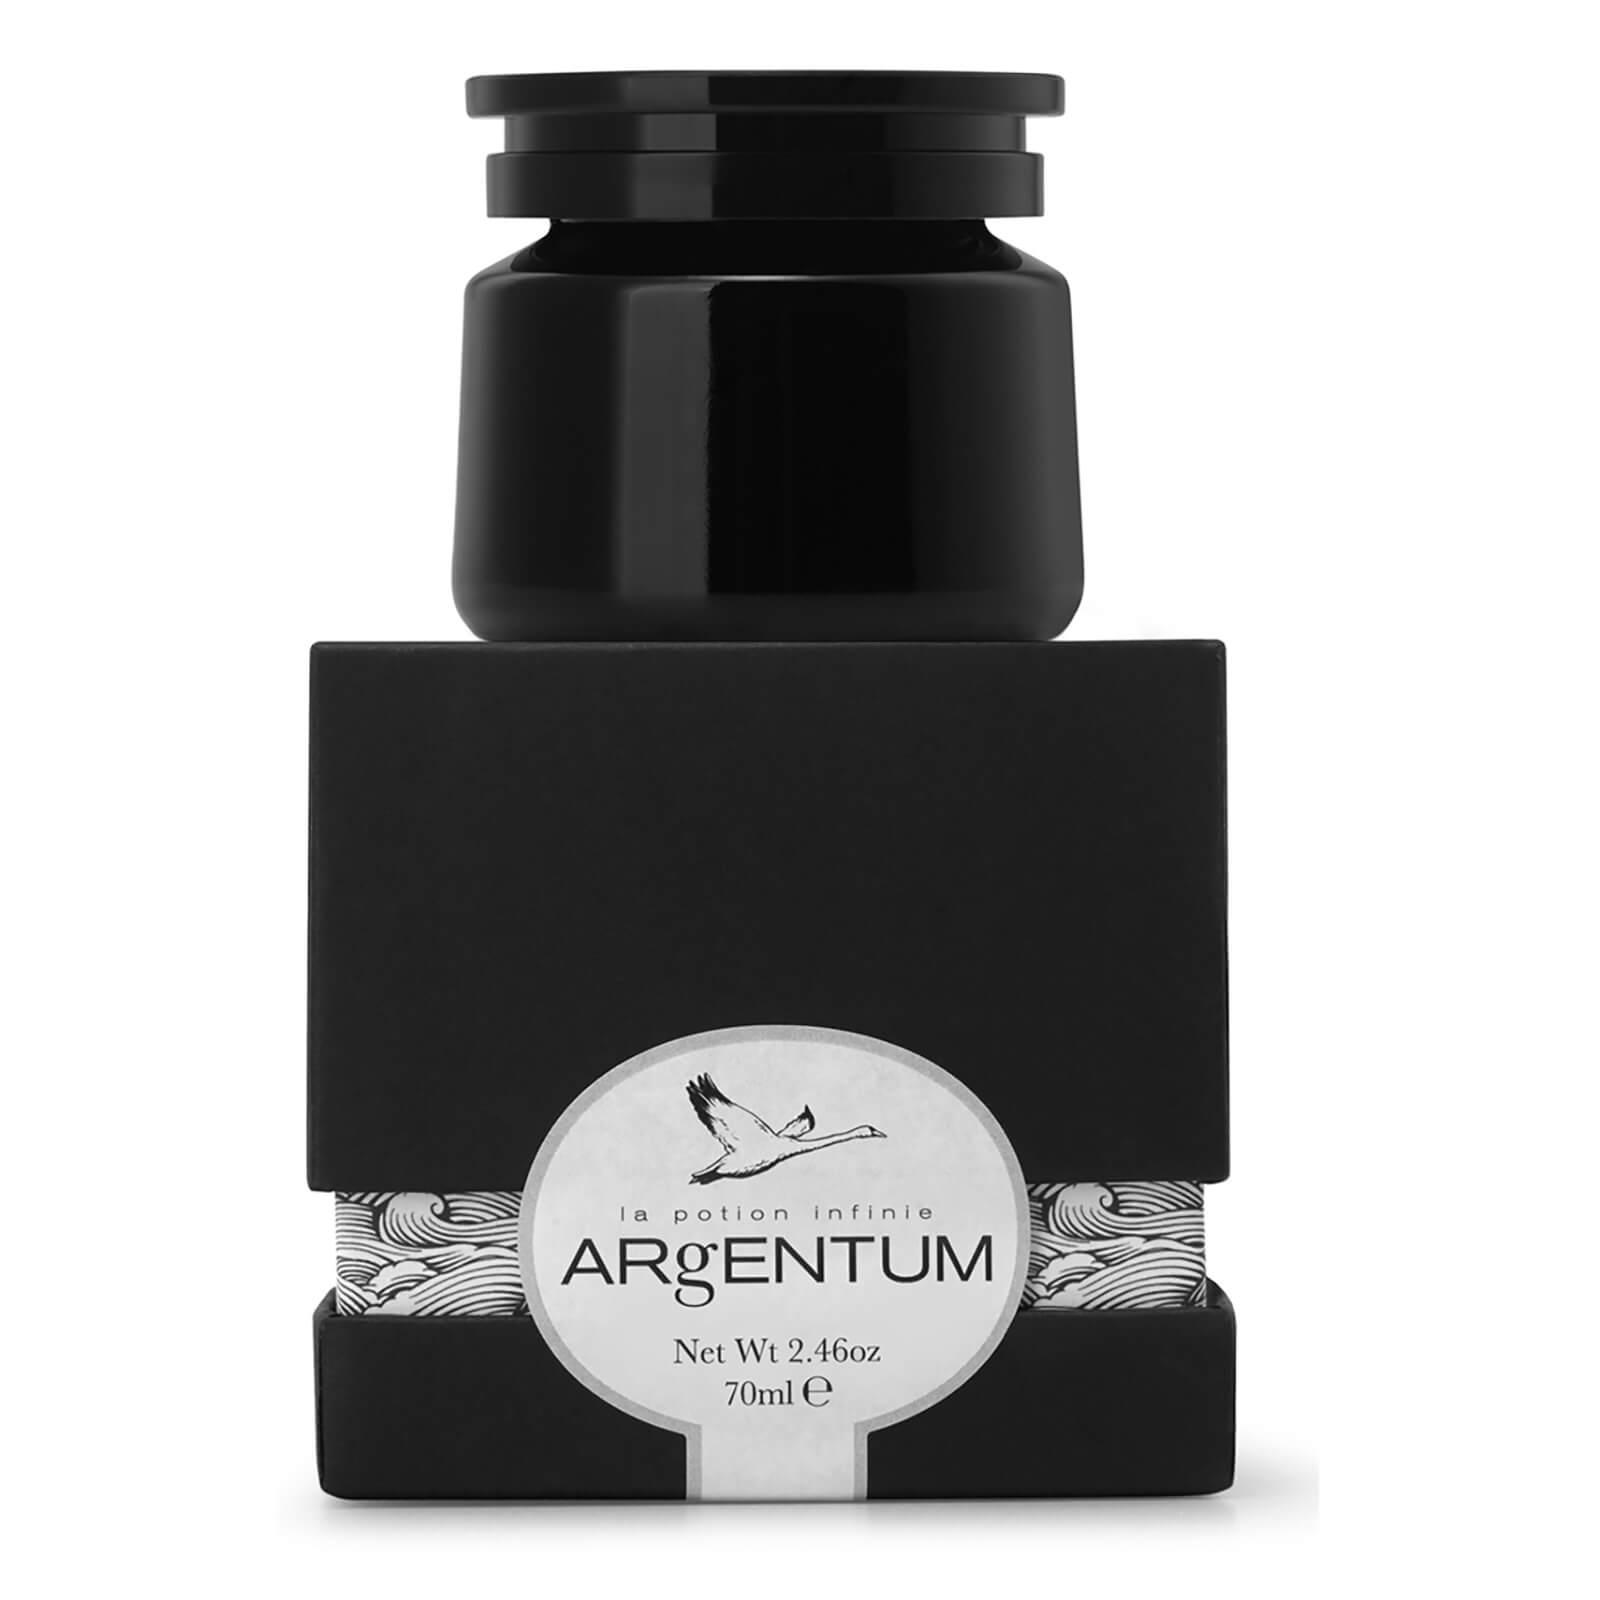 ARgENTUM LA POTION INFINIE 银露乳霜 70ml+银露乳霜 14ml+LF限量礼包